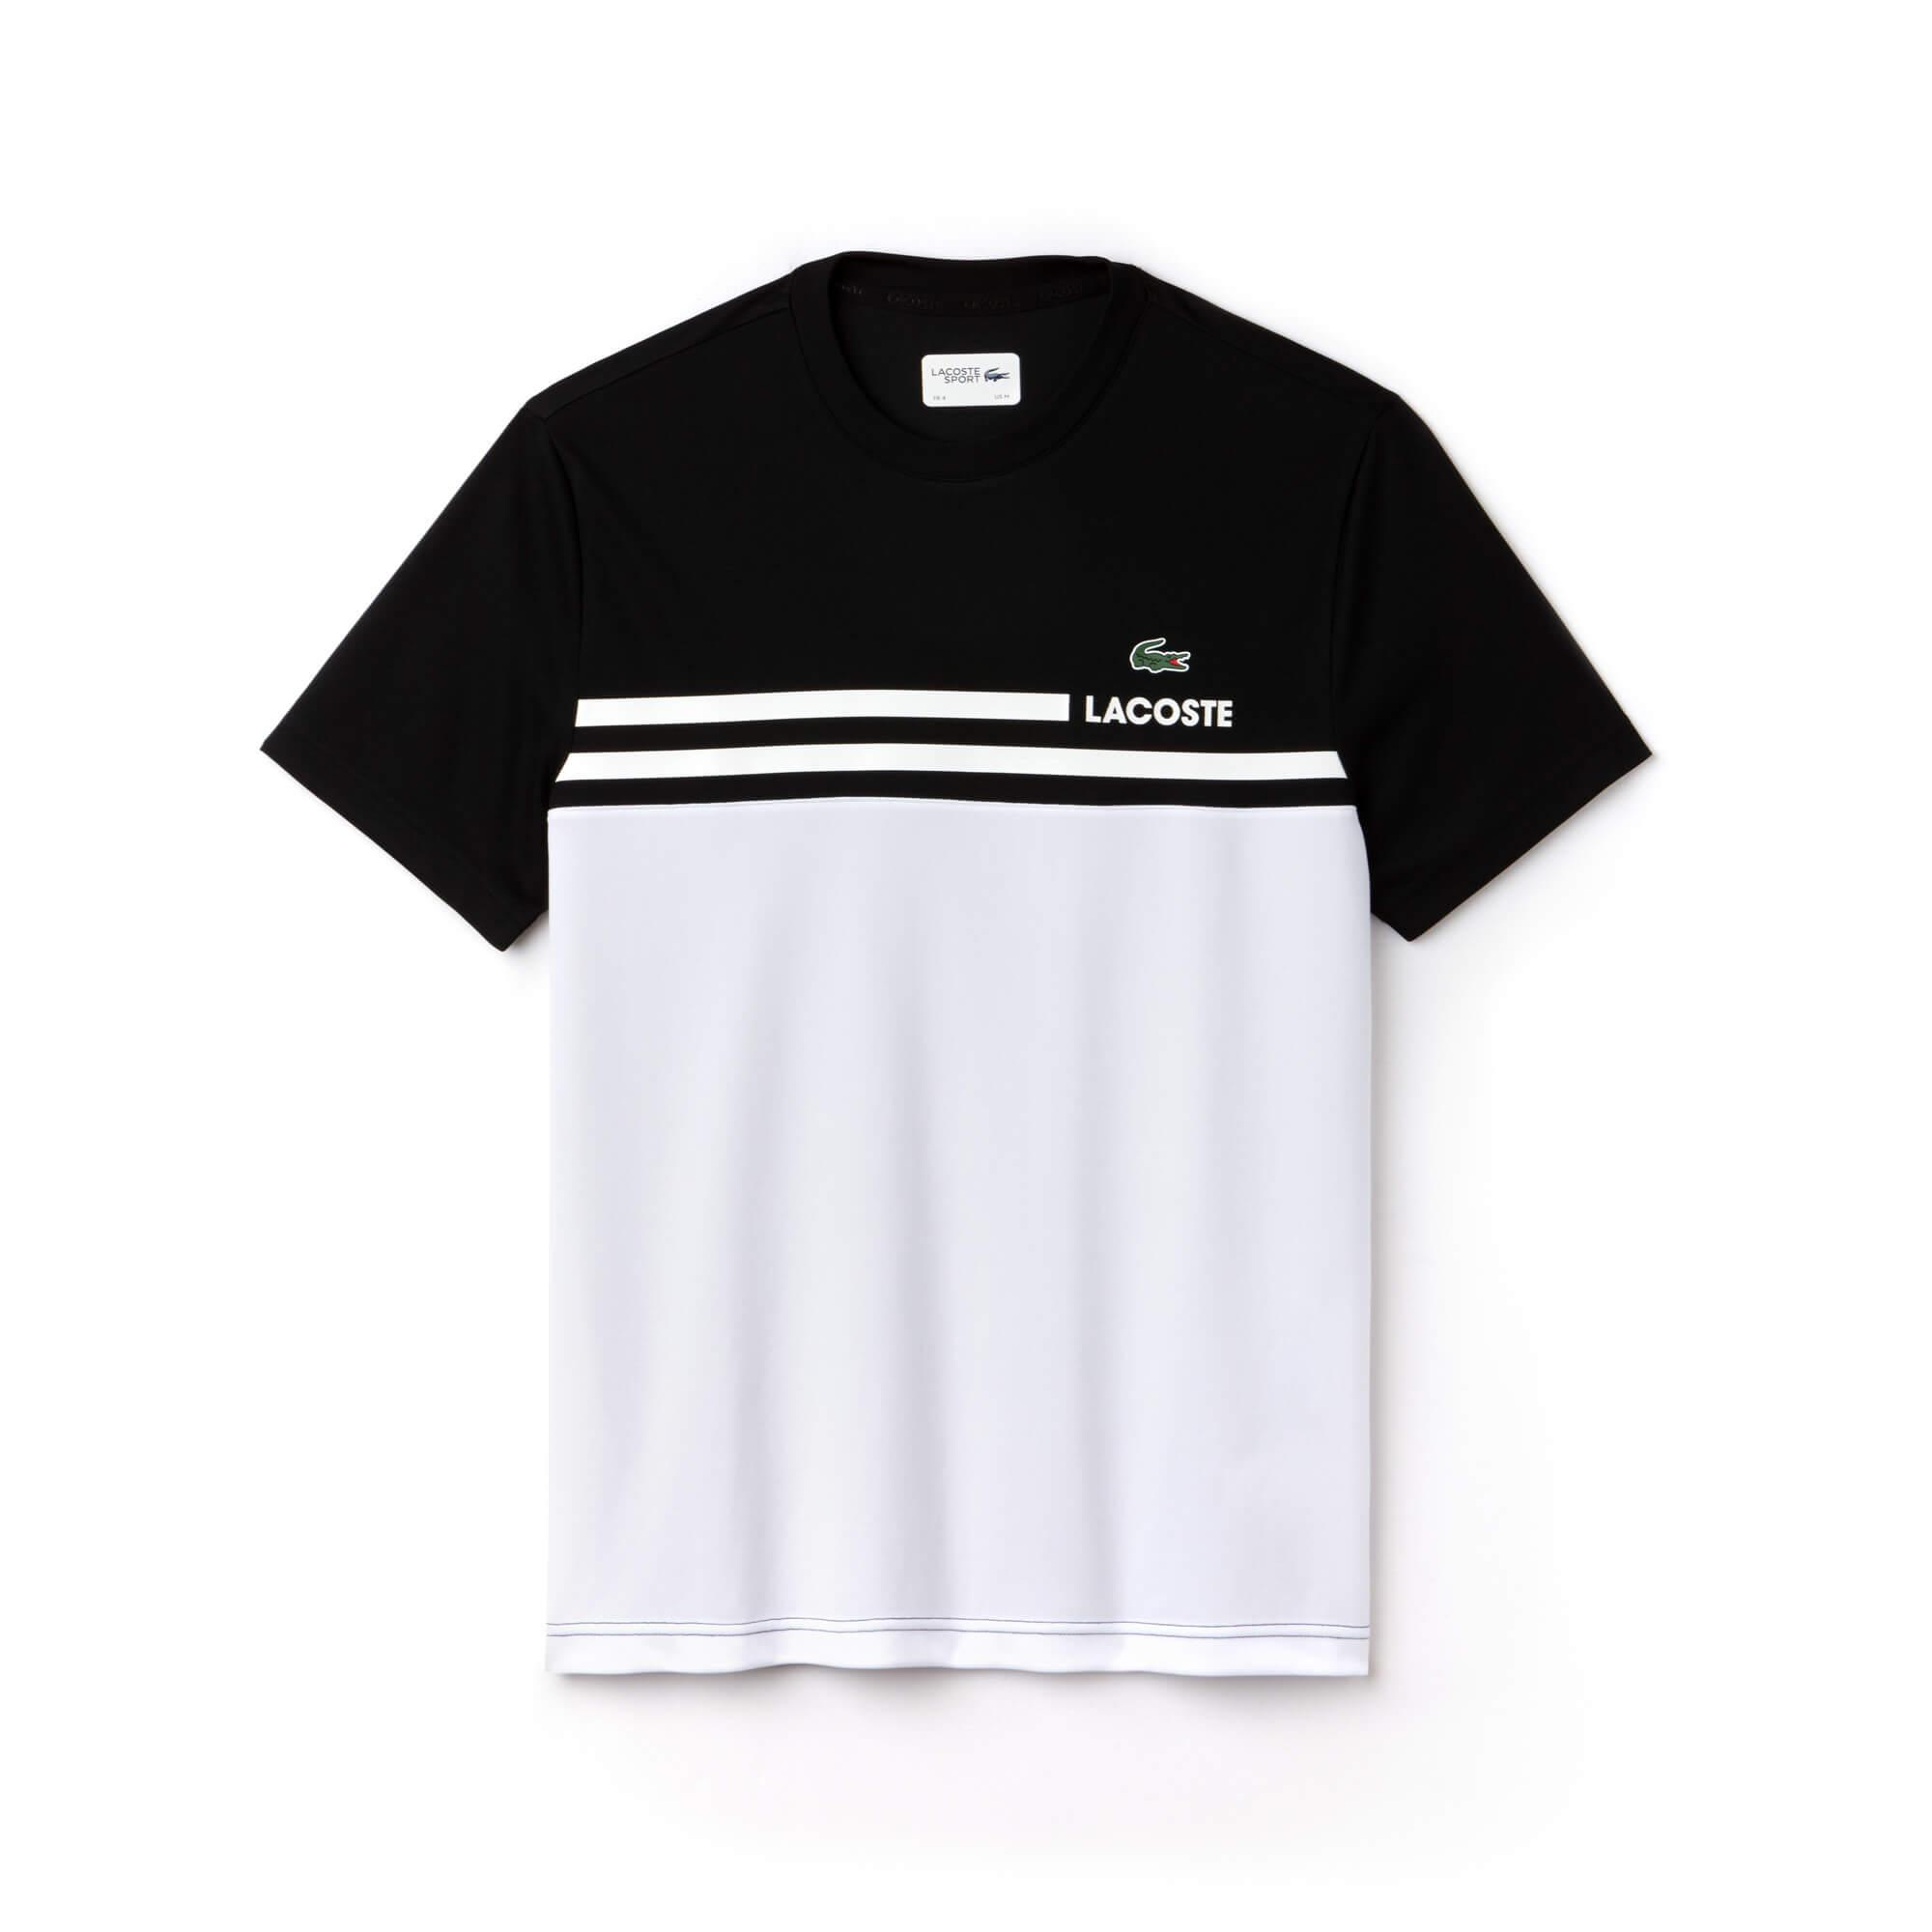 Lacoste Erkek Beyaz Spor T-Shirt